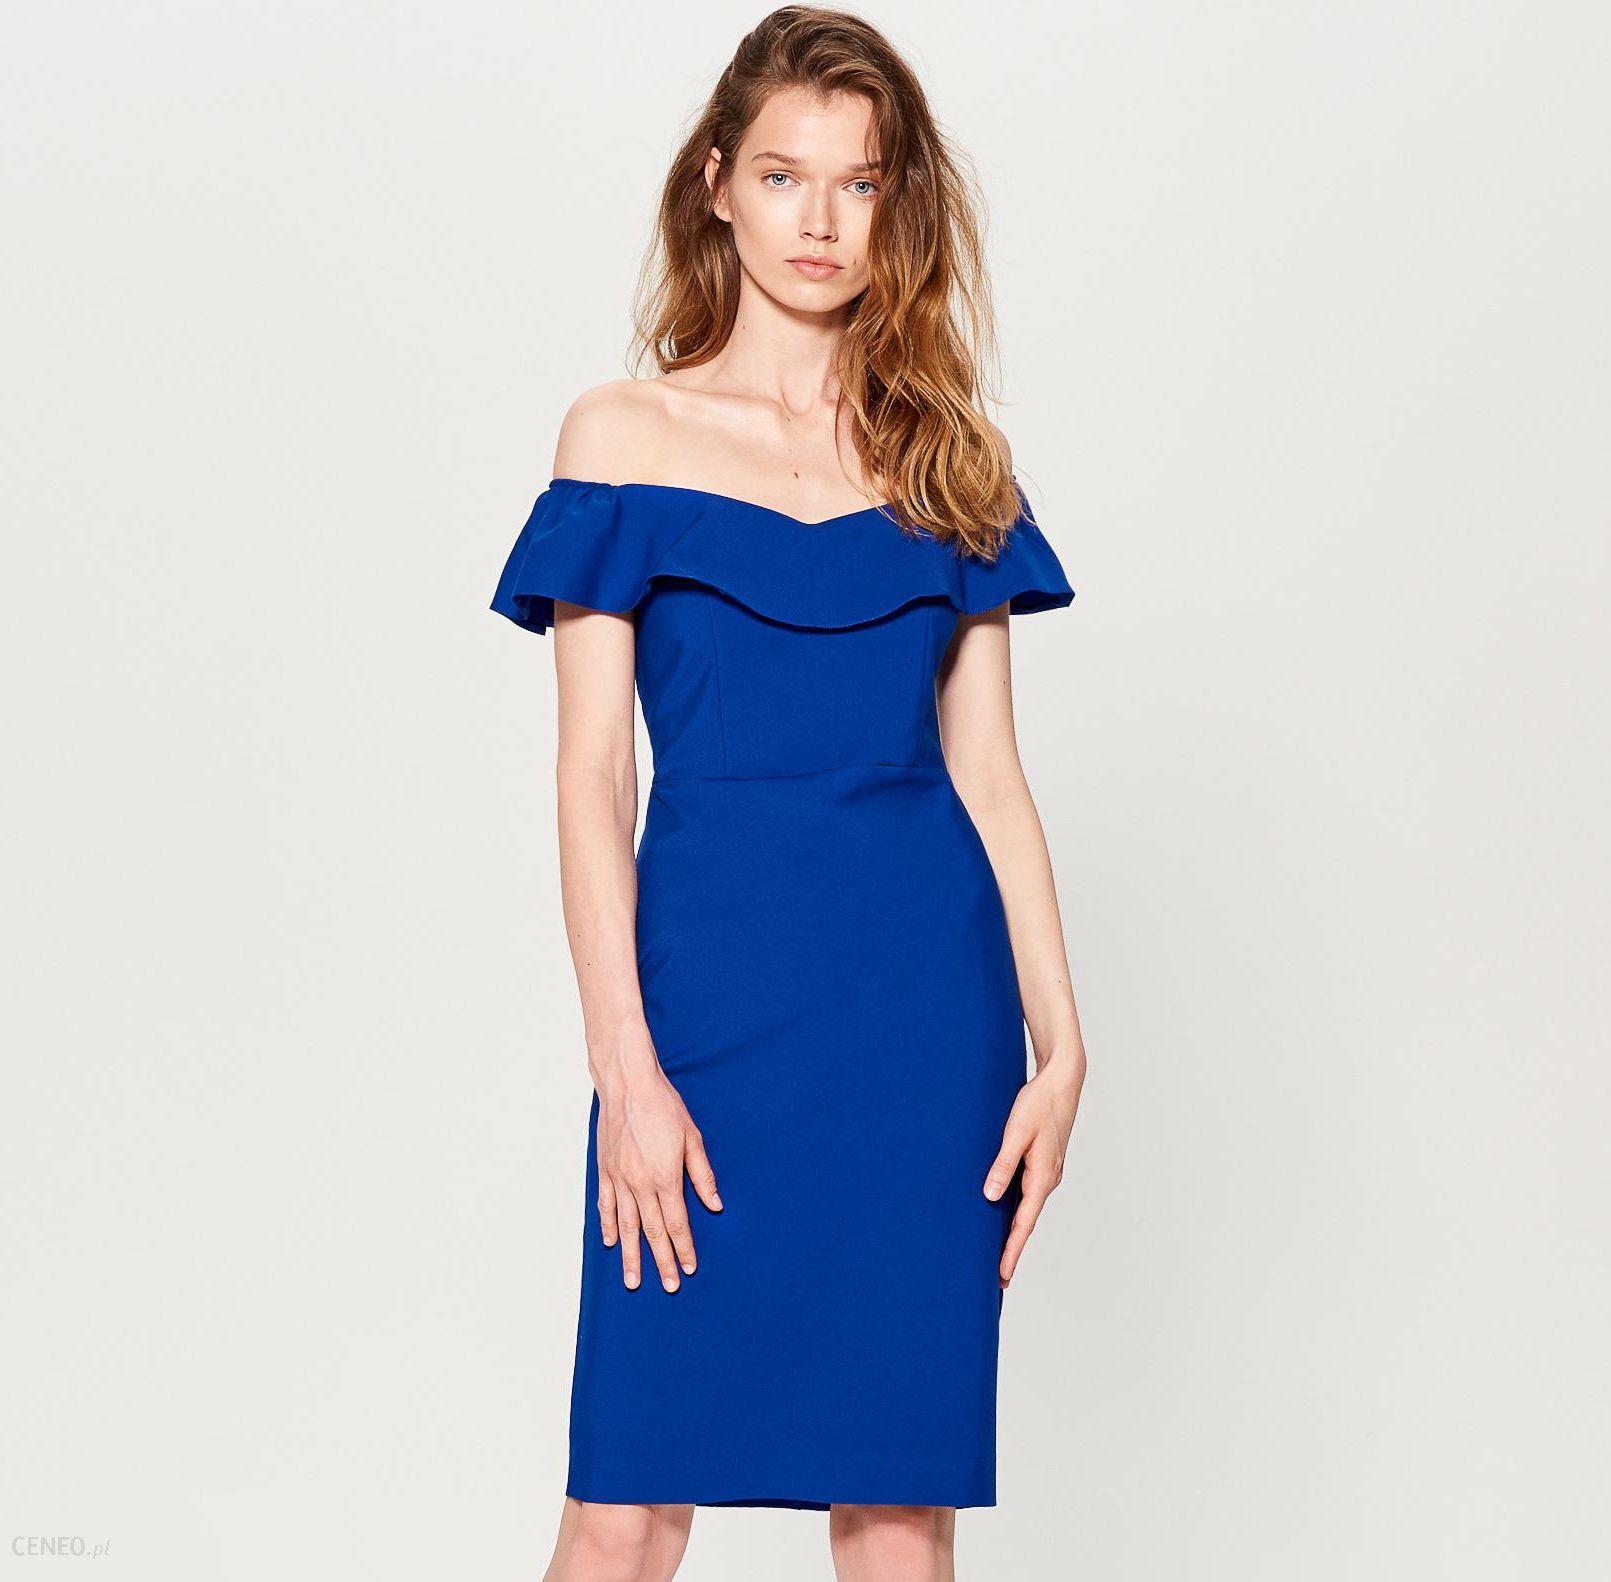 32e8953537 Mohito - Dopasowana sukienka hiszpanka - Niebieski - Ceny i opinie ...